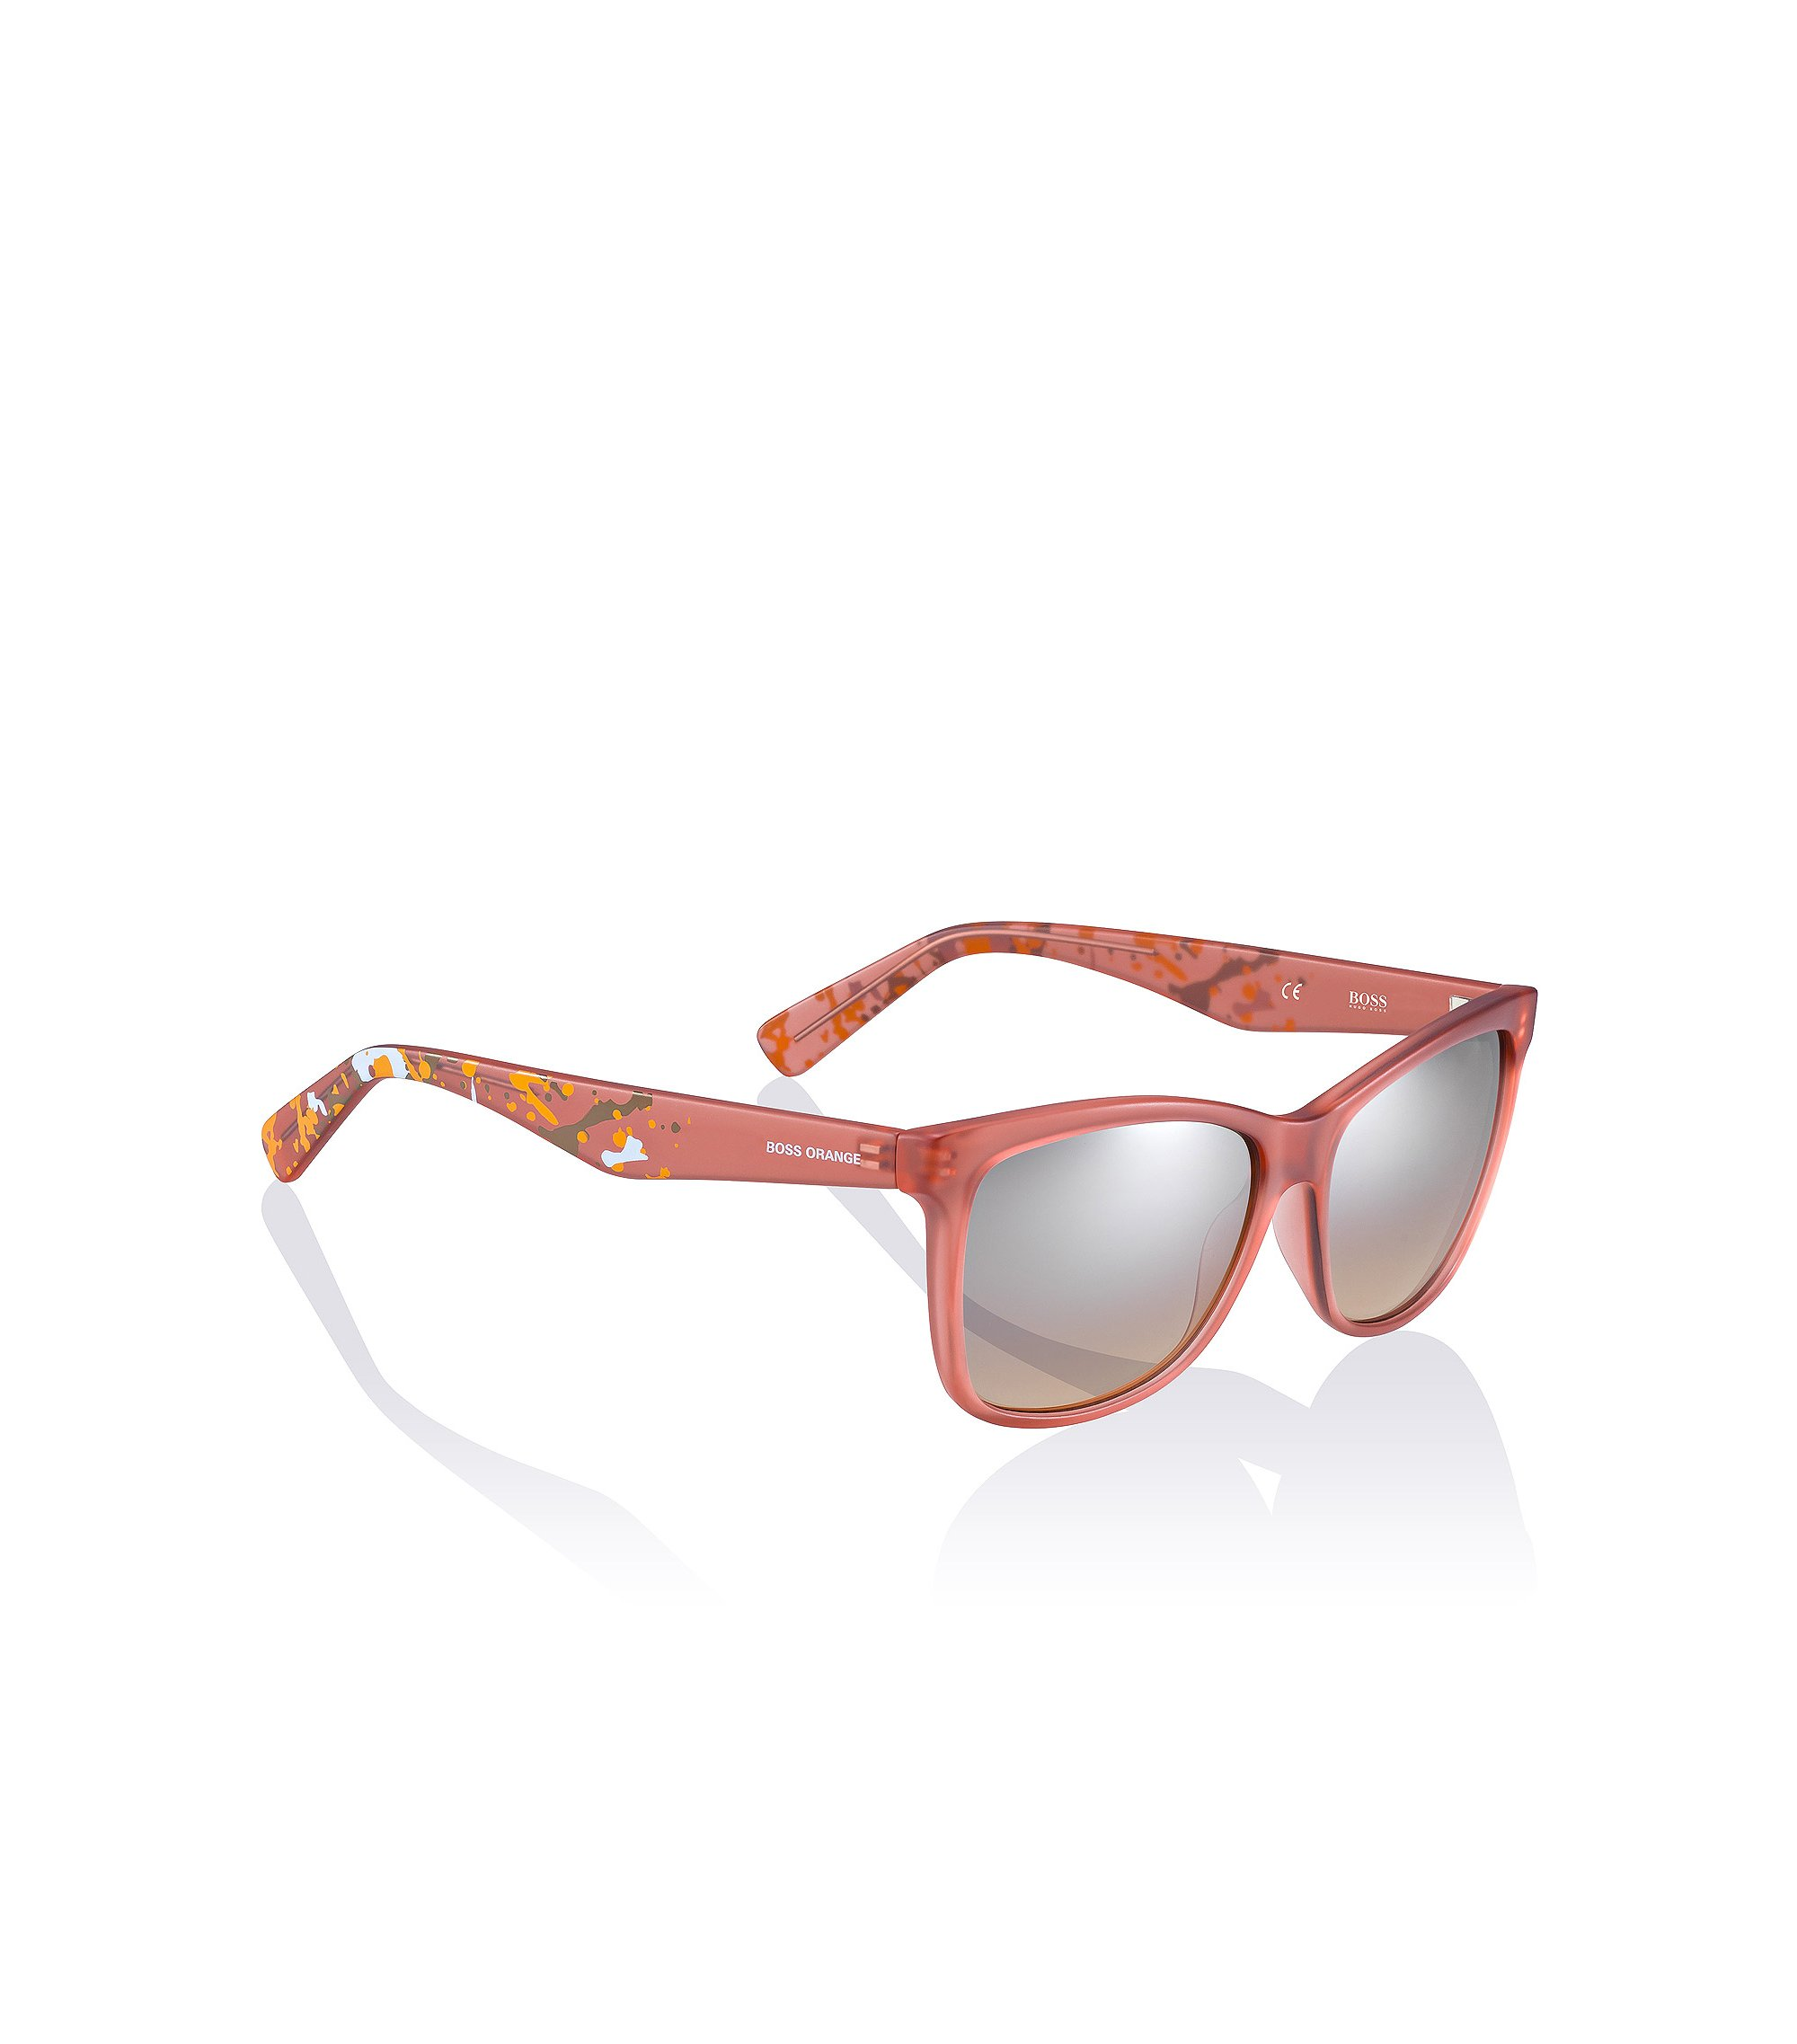 Sonnenbrille ´BO 0212/S`, Assorted-Pre-Pack